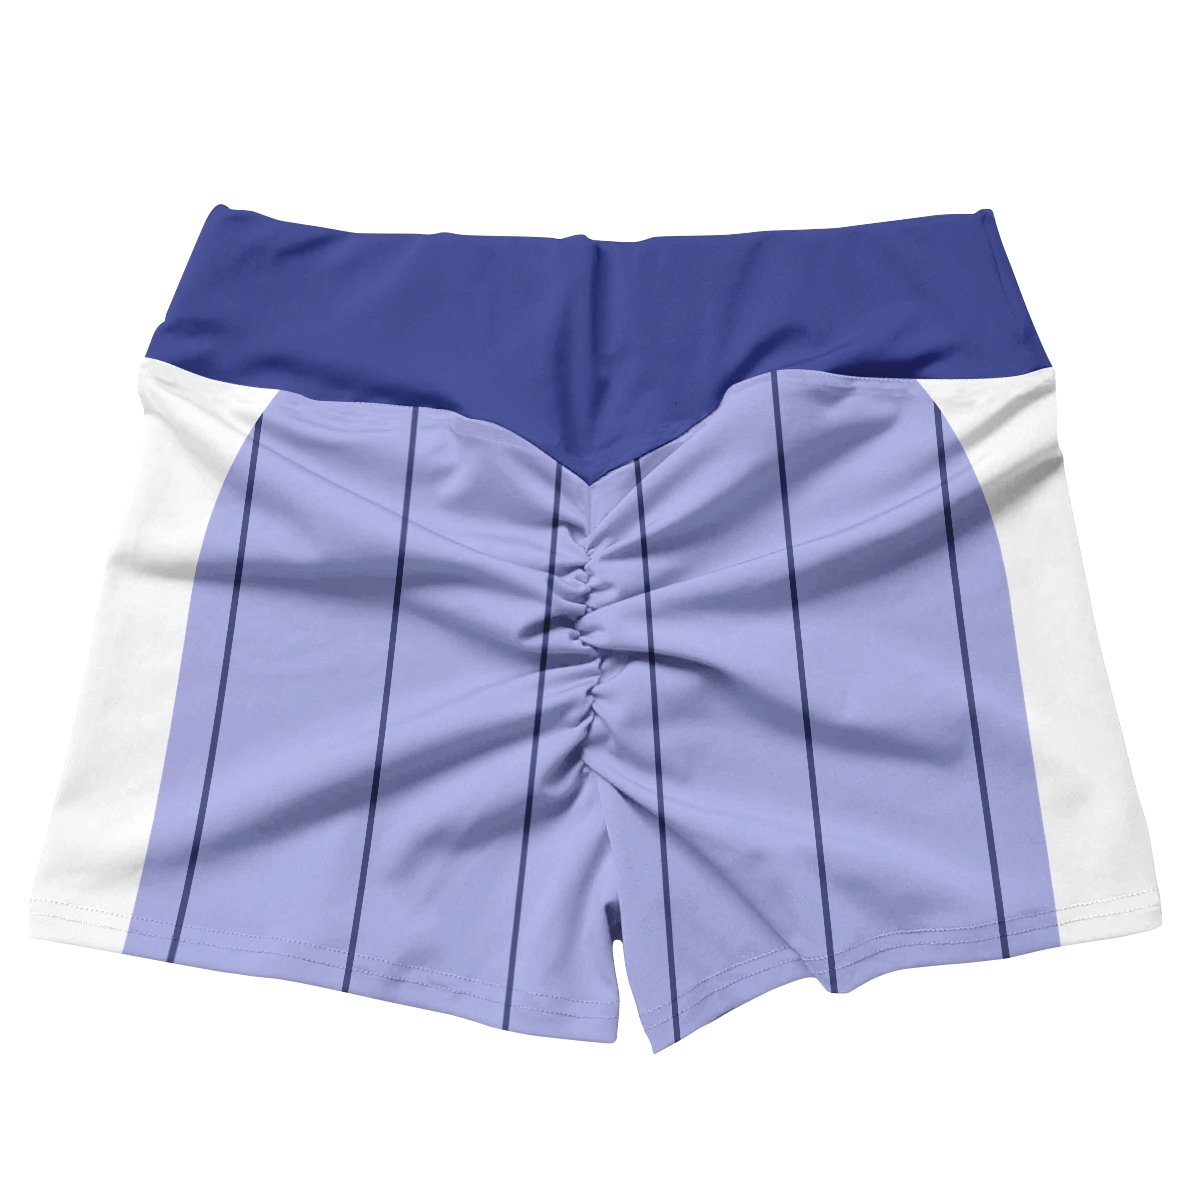 hinata summer active wear set 563438 - Anime Swimsuits